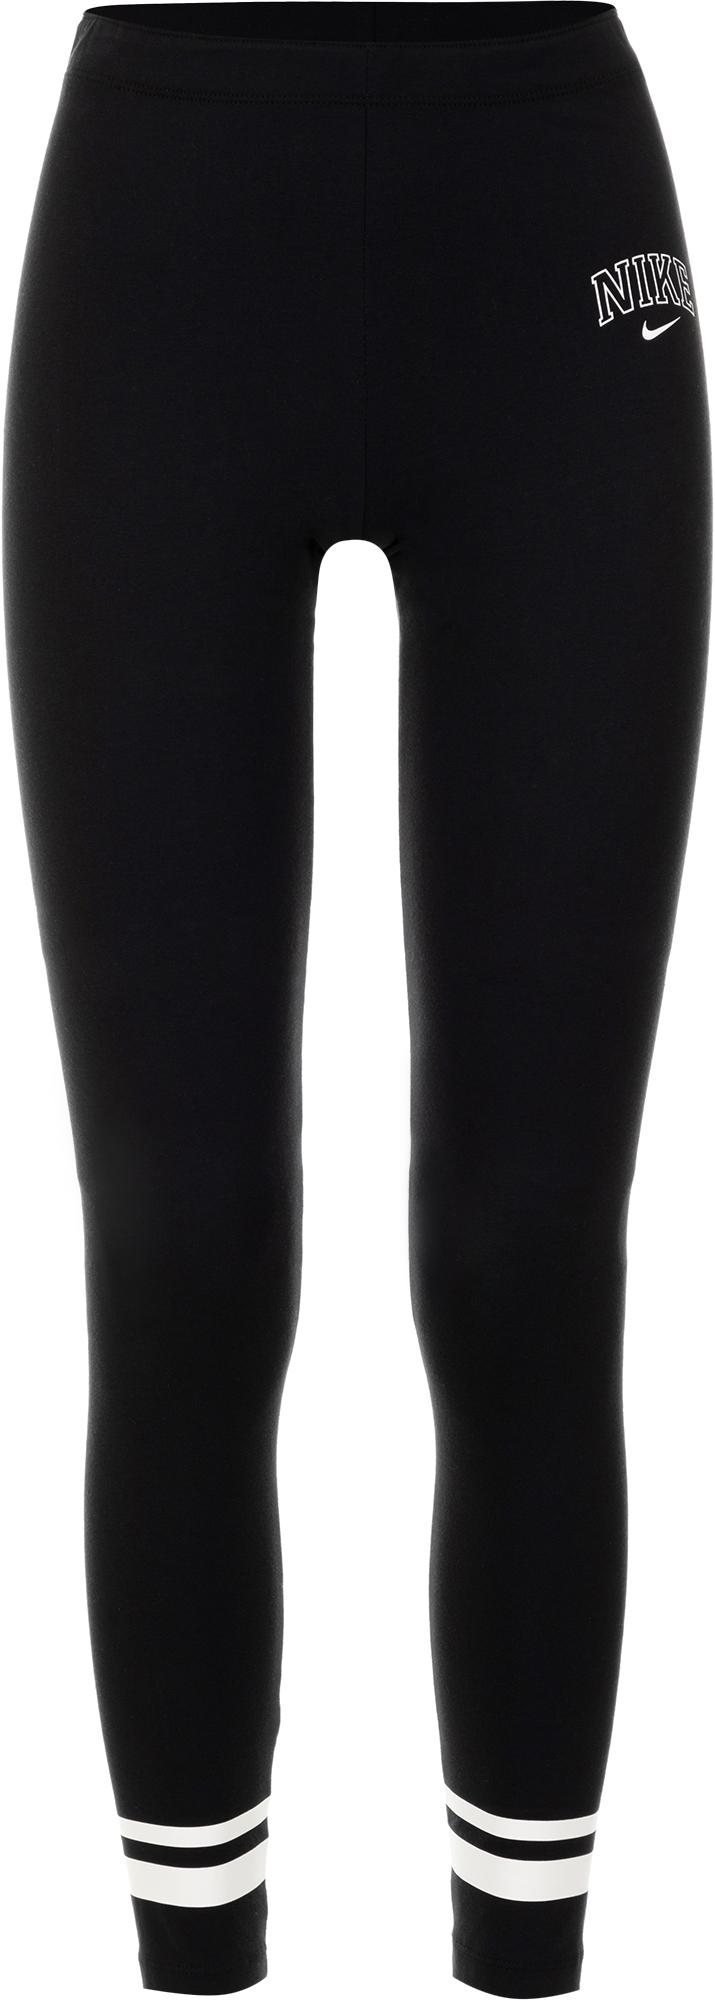 Nike Легинсы женские Nike Sportswear, размер 40-42 nike легинсы женские nike sculpt hyper